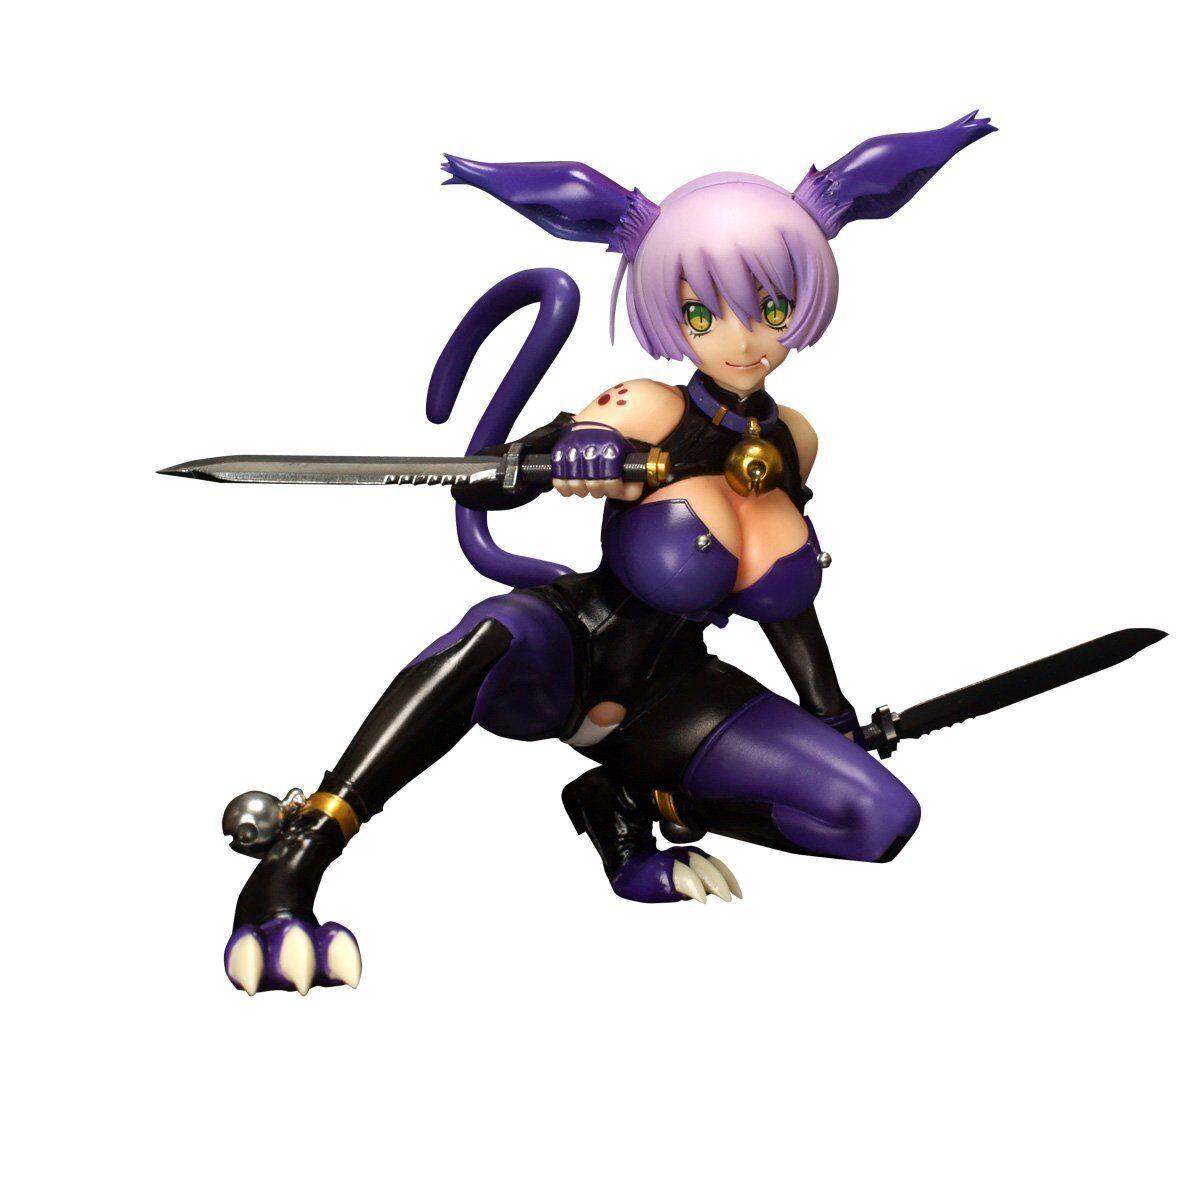 Cuento de hadas figura villanos volumen 2 Gato de Cheshire asesino púrpuraa Medianoche versión